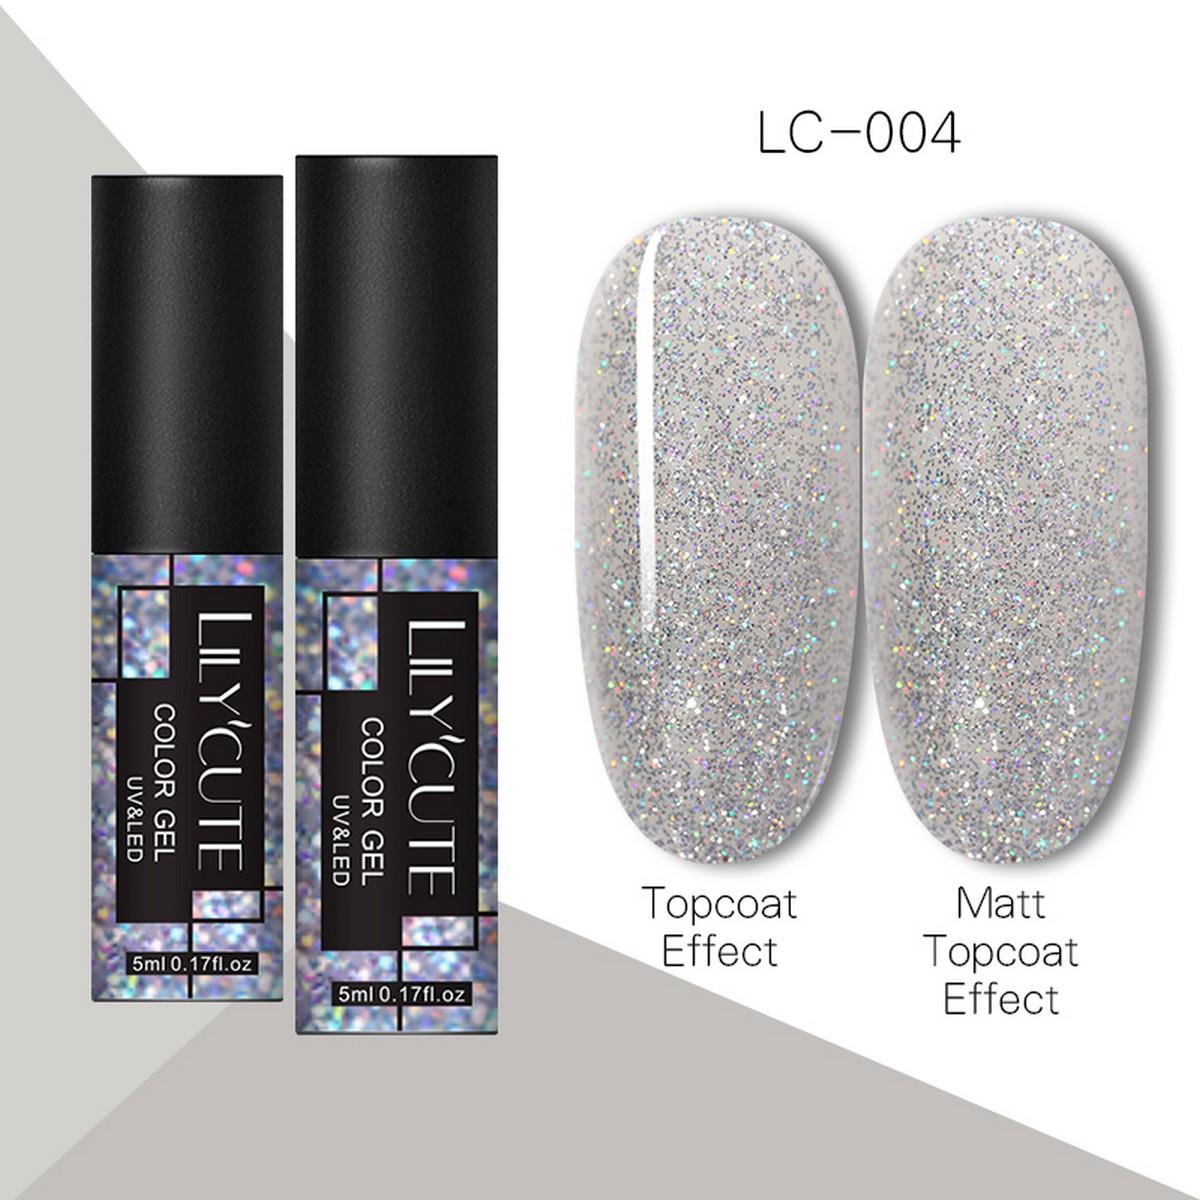 LILYCUTE Newest 100 Colors UV Gel Nail Polish Semi Permanent Soak Off UV Gel Varnish Long Lasting Nail Art Varnish Base Top Coat